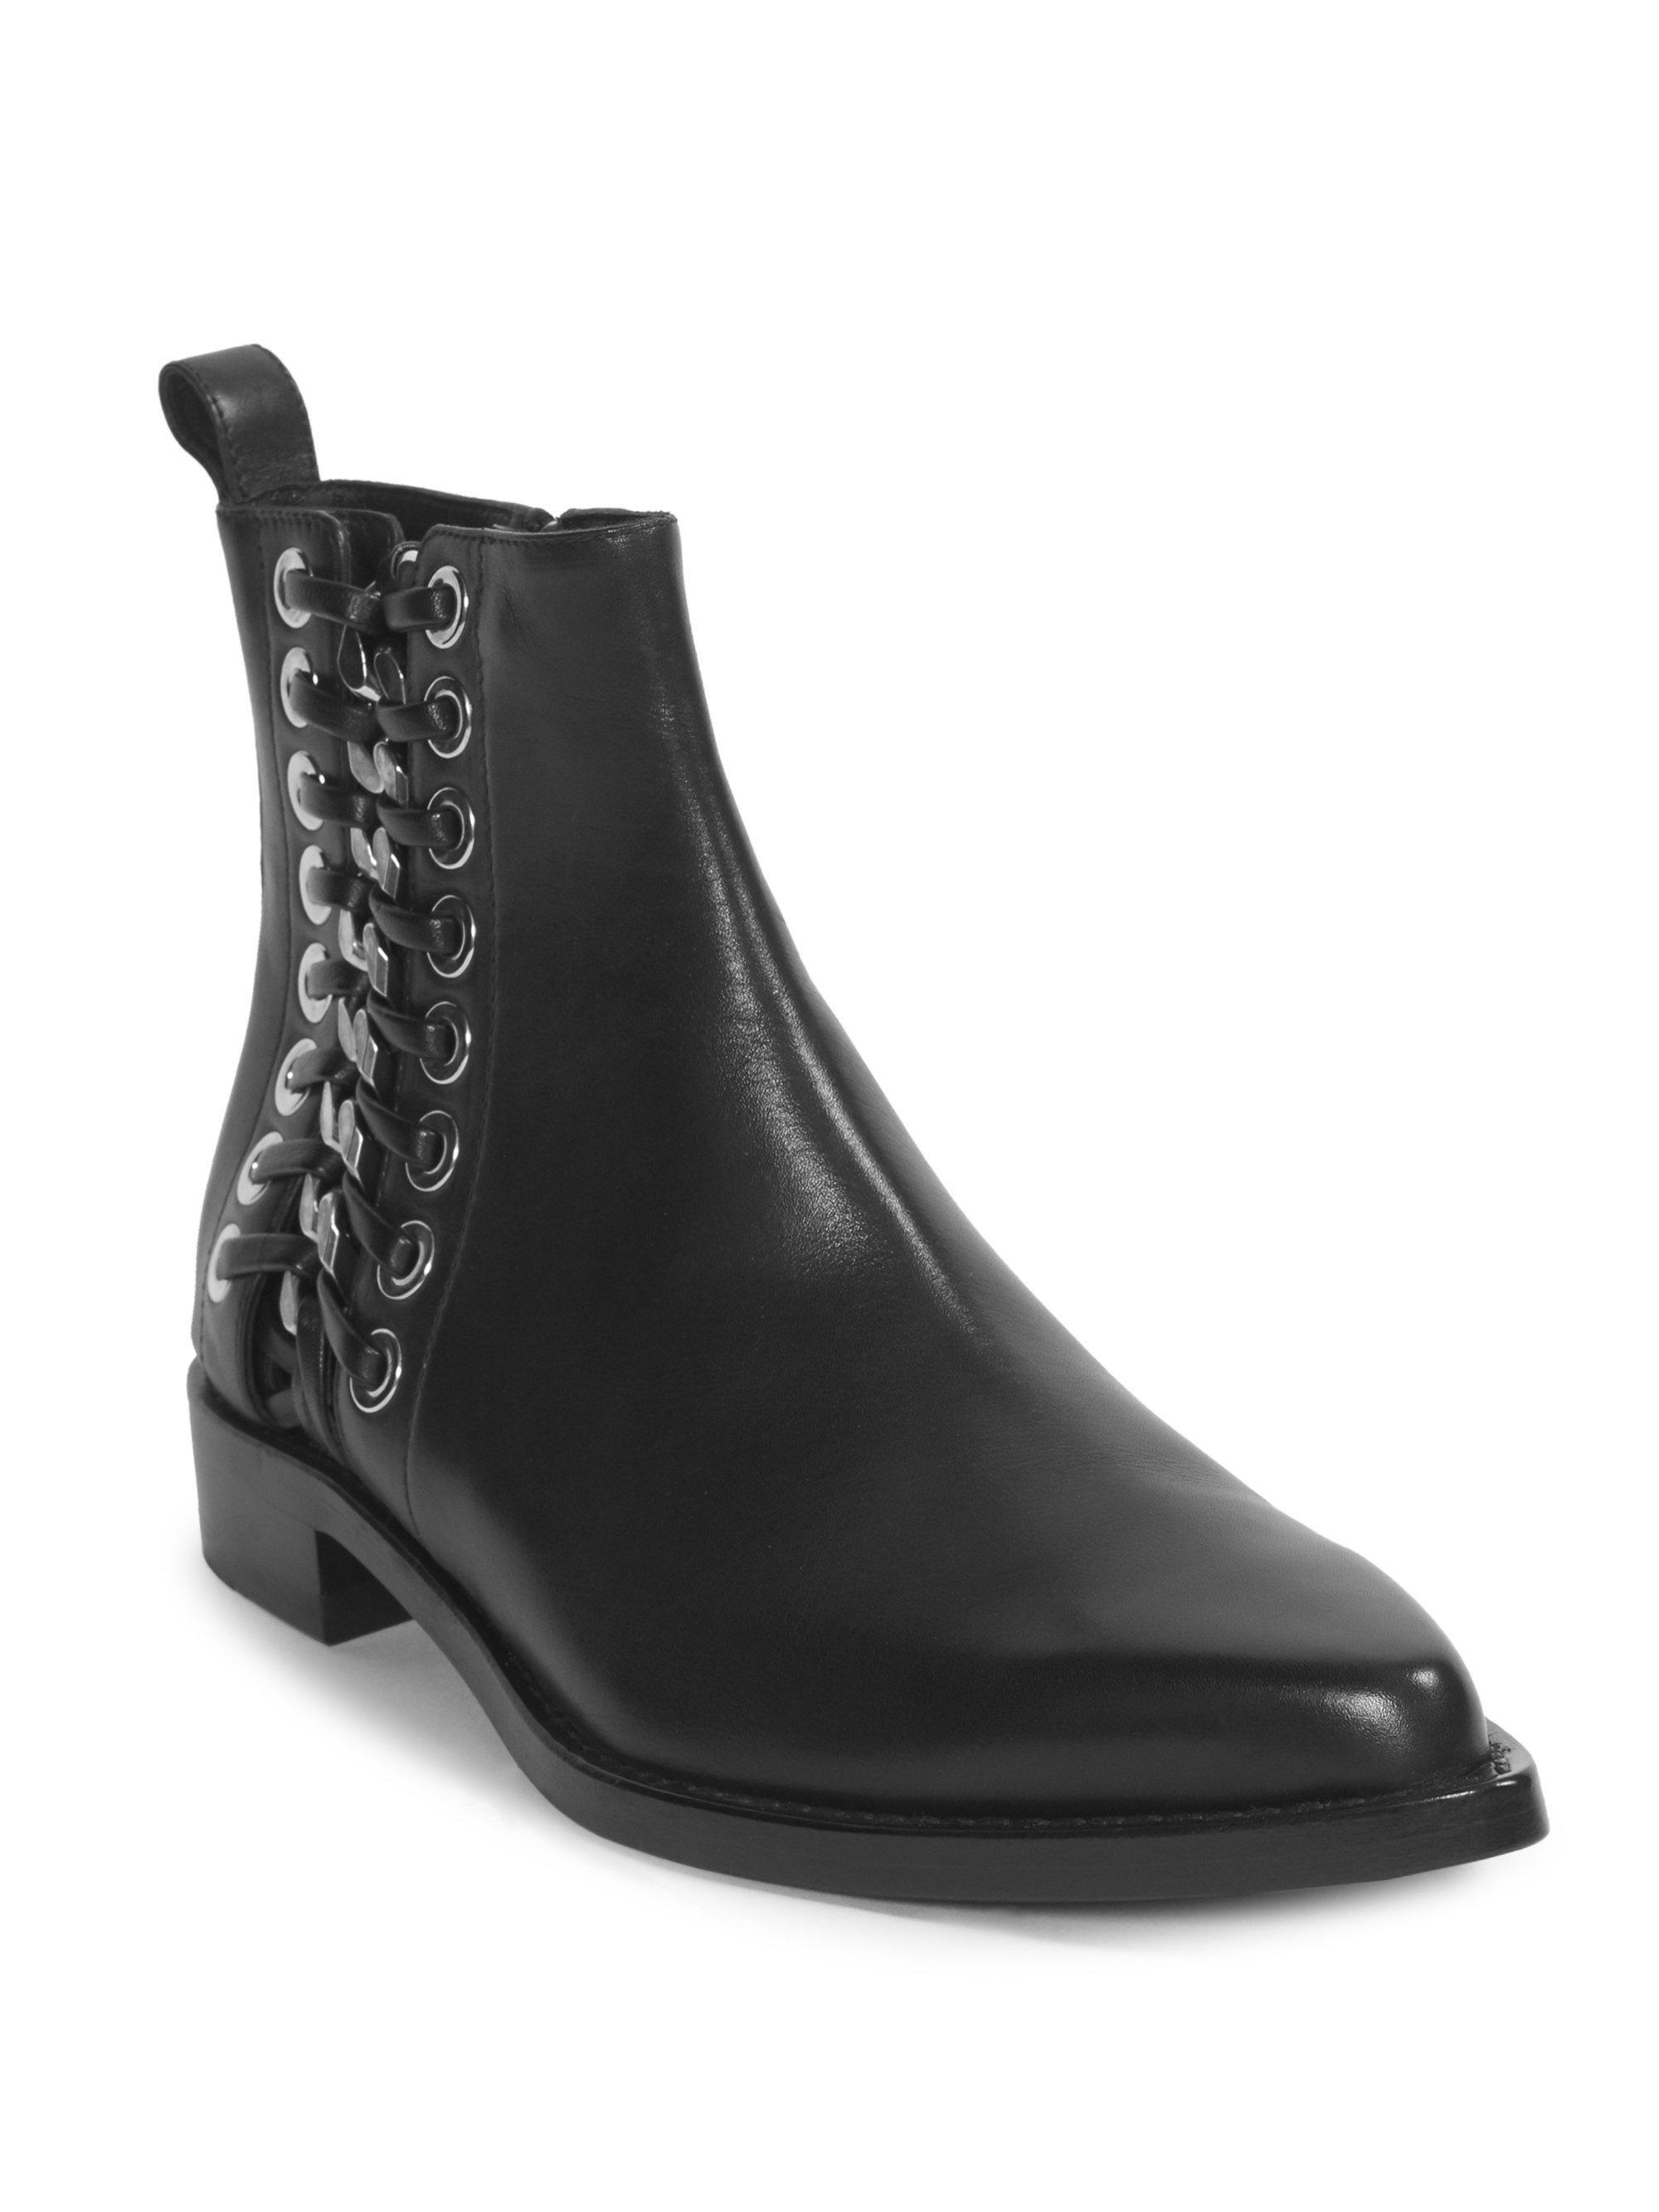 Alexander McQueen Side Detail Leather Booties 8Fn1CT63